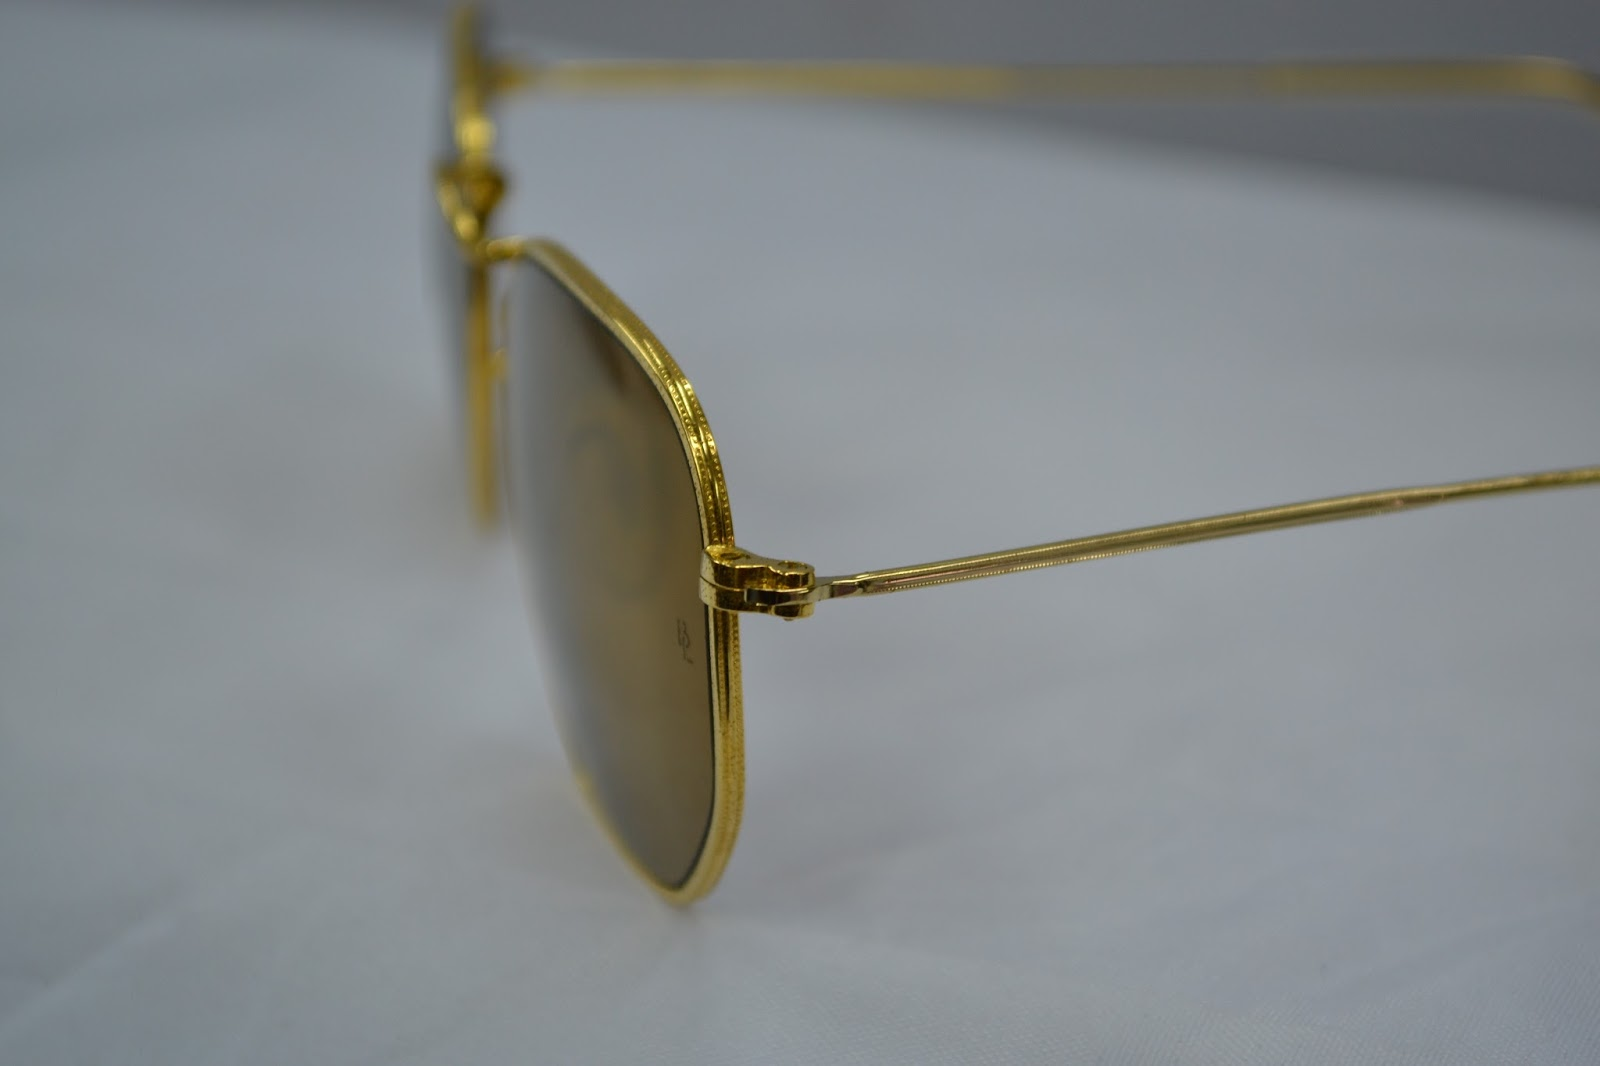 8105d5721f8 Rayban Diamond Hard Usa For Sale. Vintage sunglass  ...